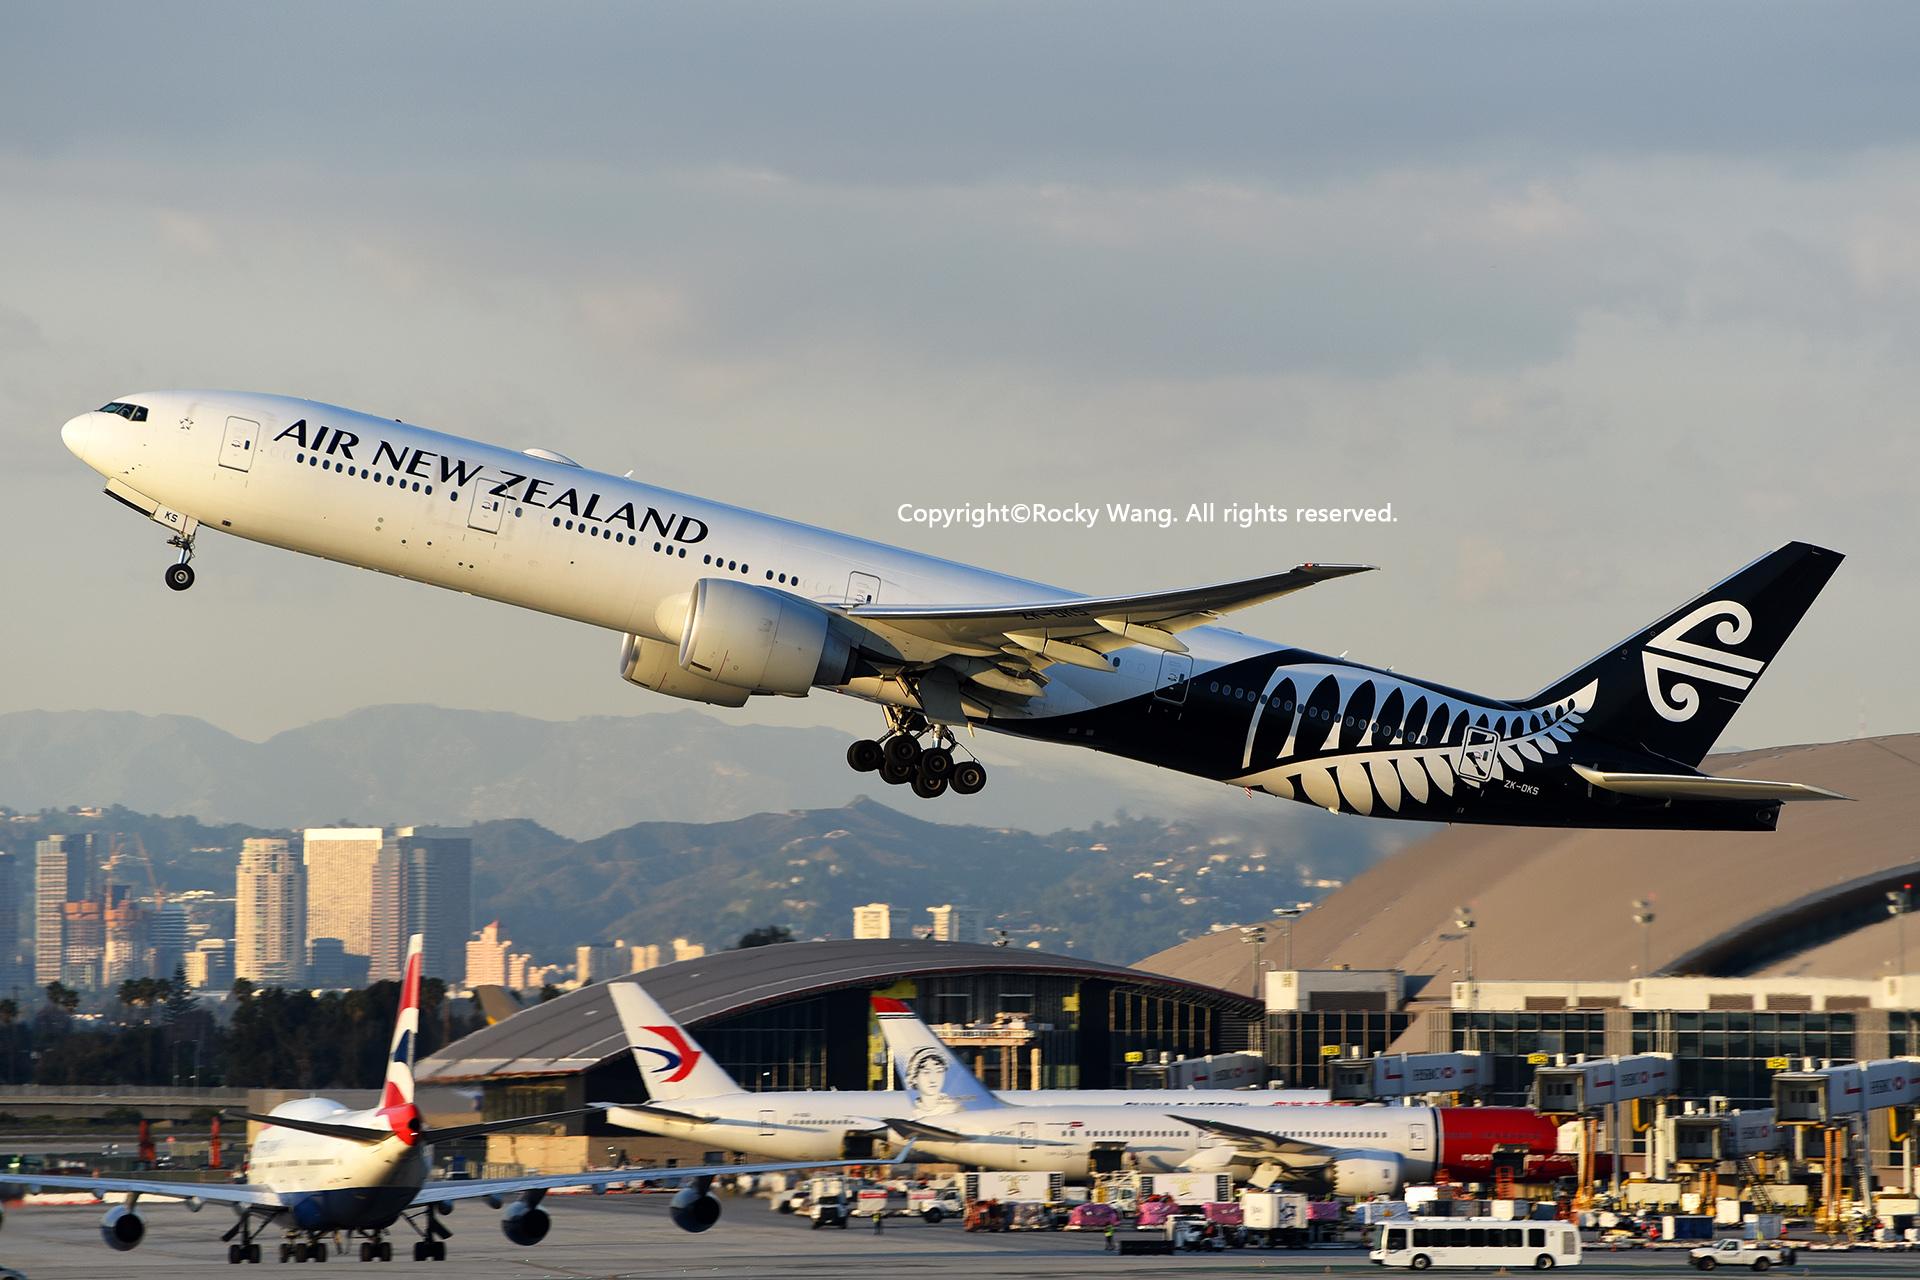 Re:[原创]LAX-暖冬与残夏 BOEING 777-319ER ZK-OKS Los Angeles Int'l Airport